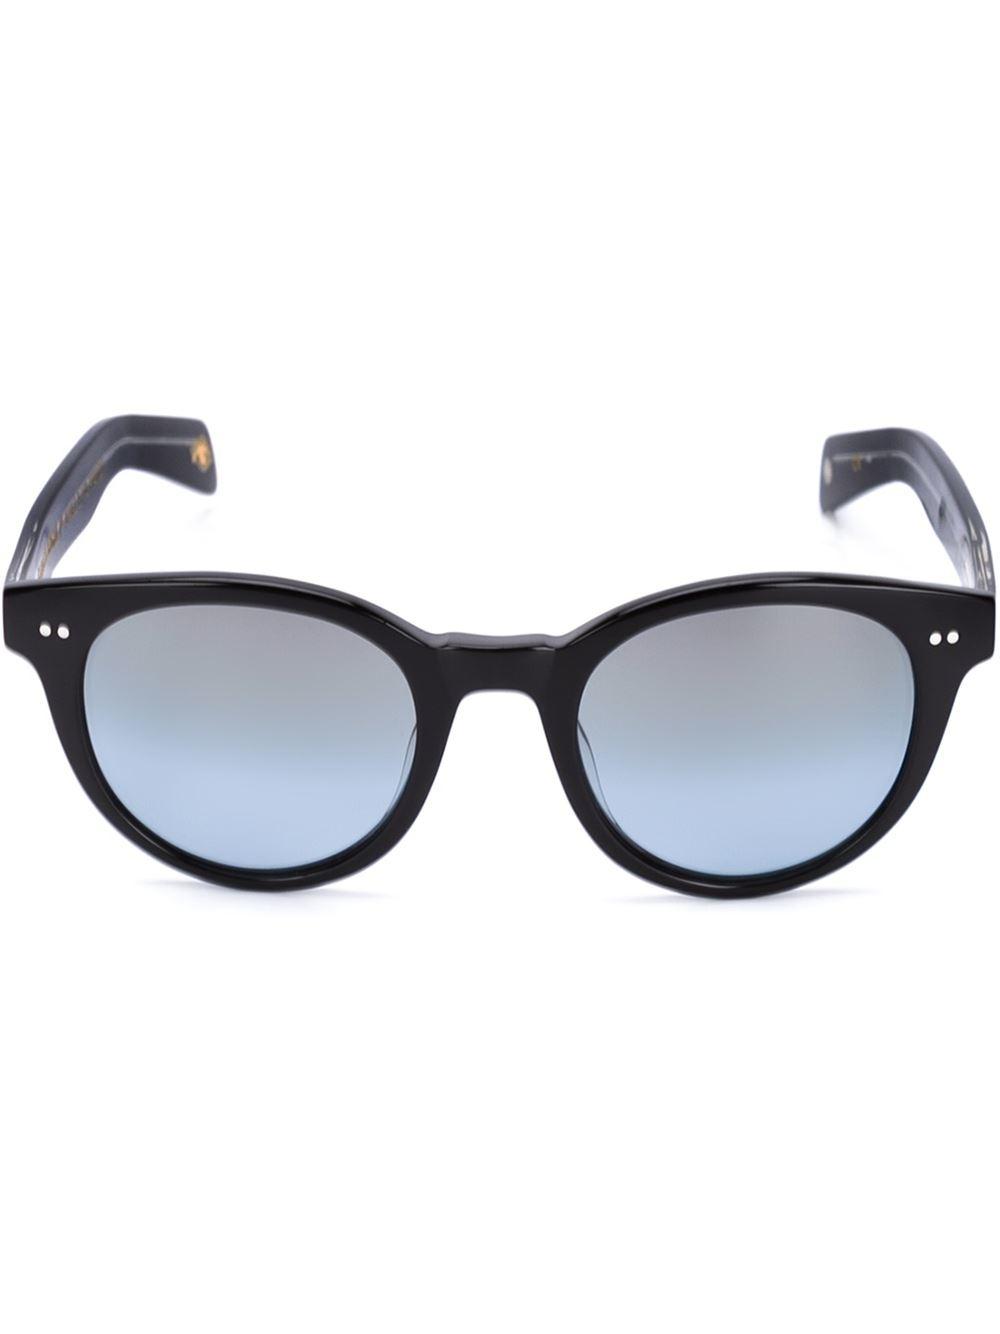 d42b1dda834 Dillon Smoke Sunglasses